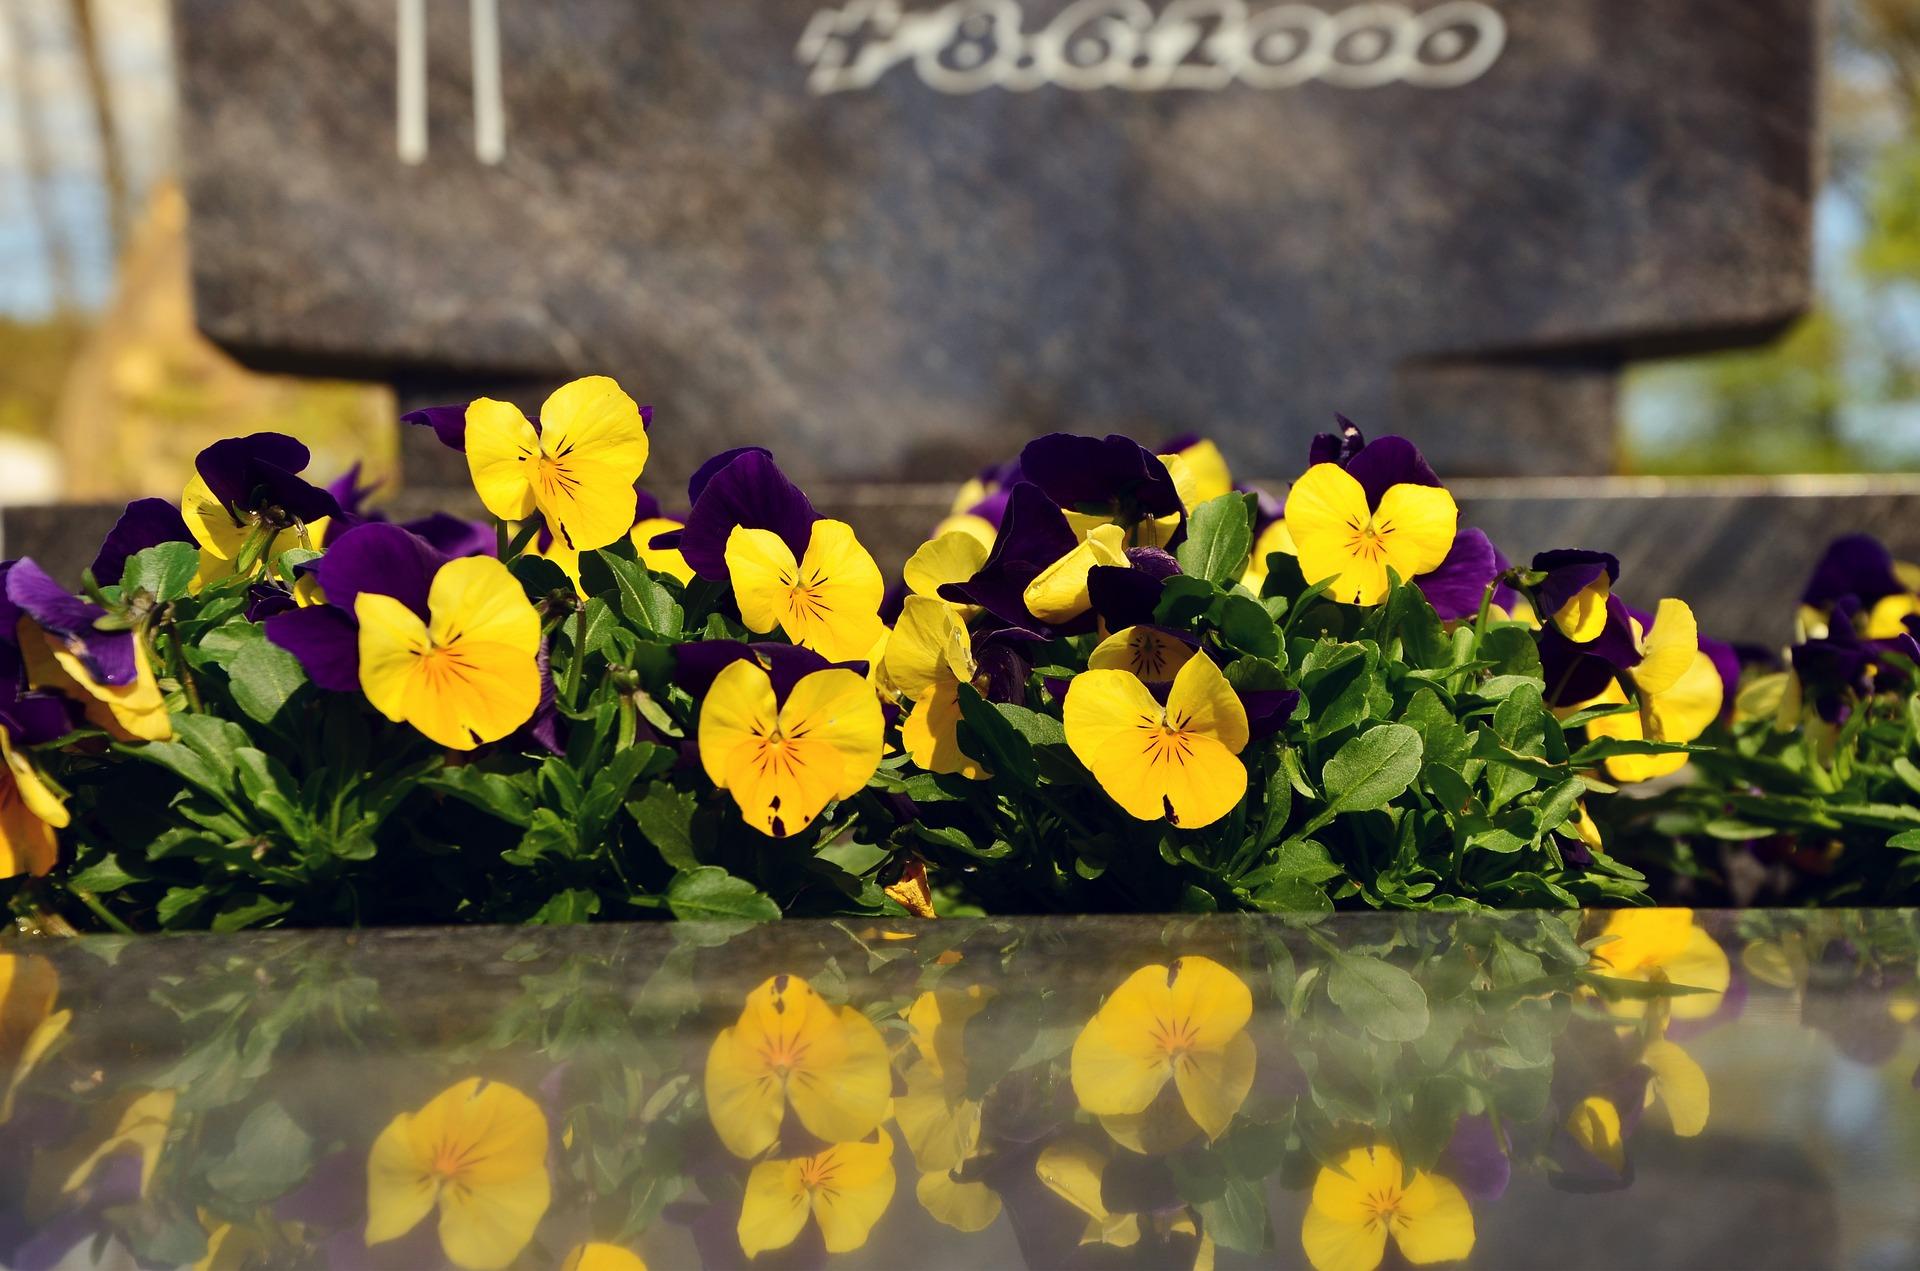 grave-3184969_1920